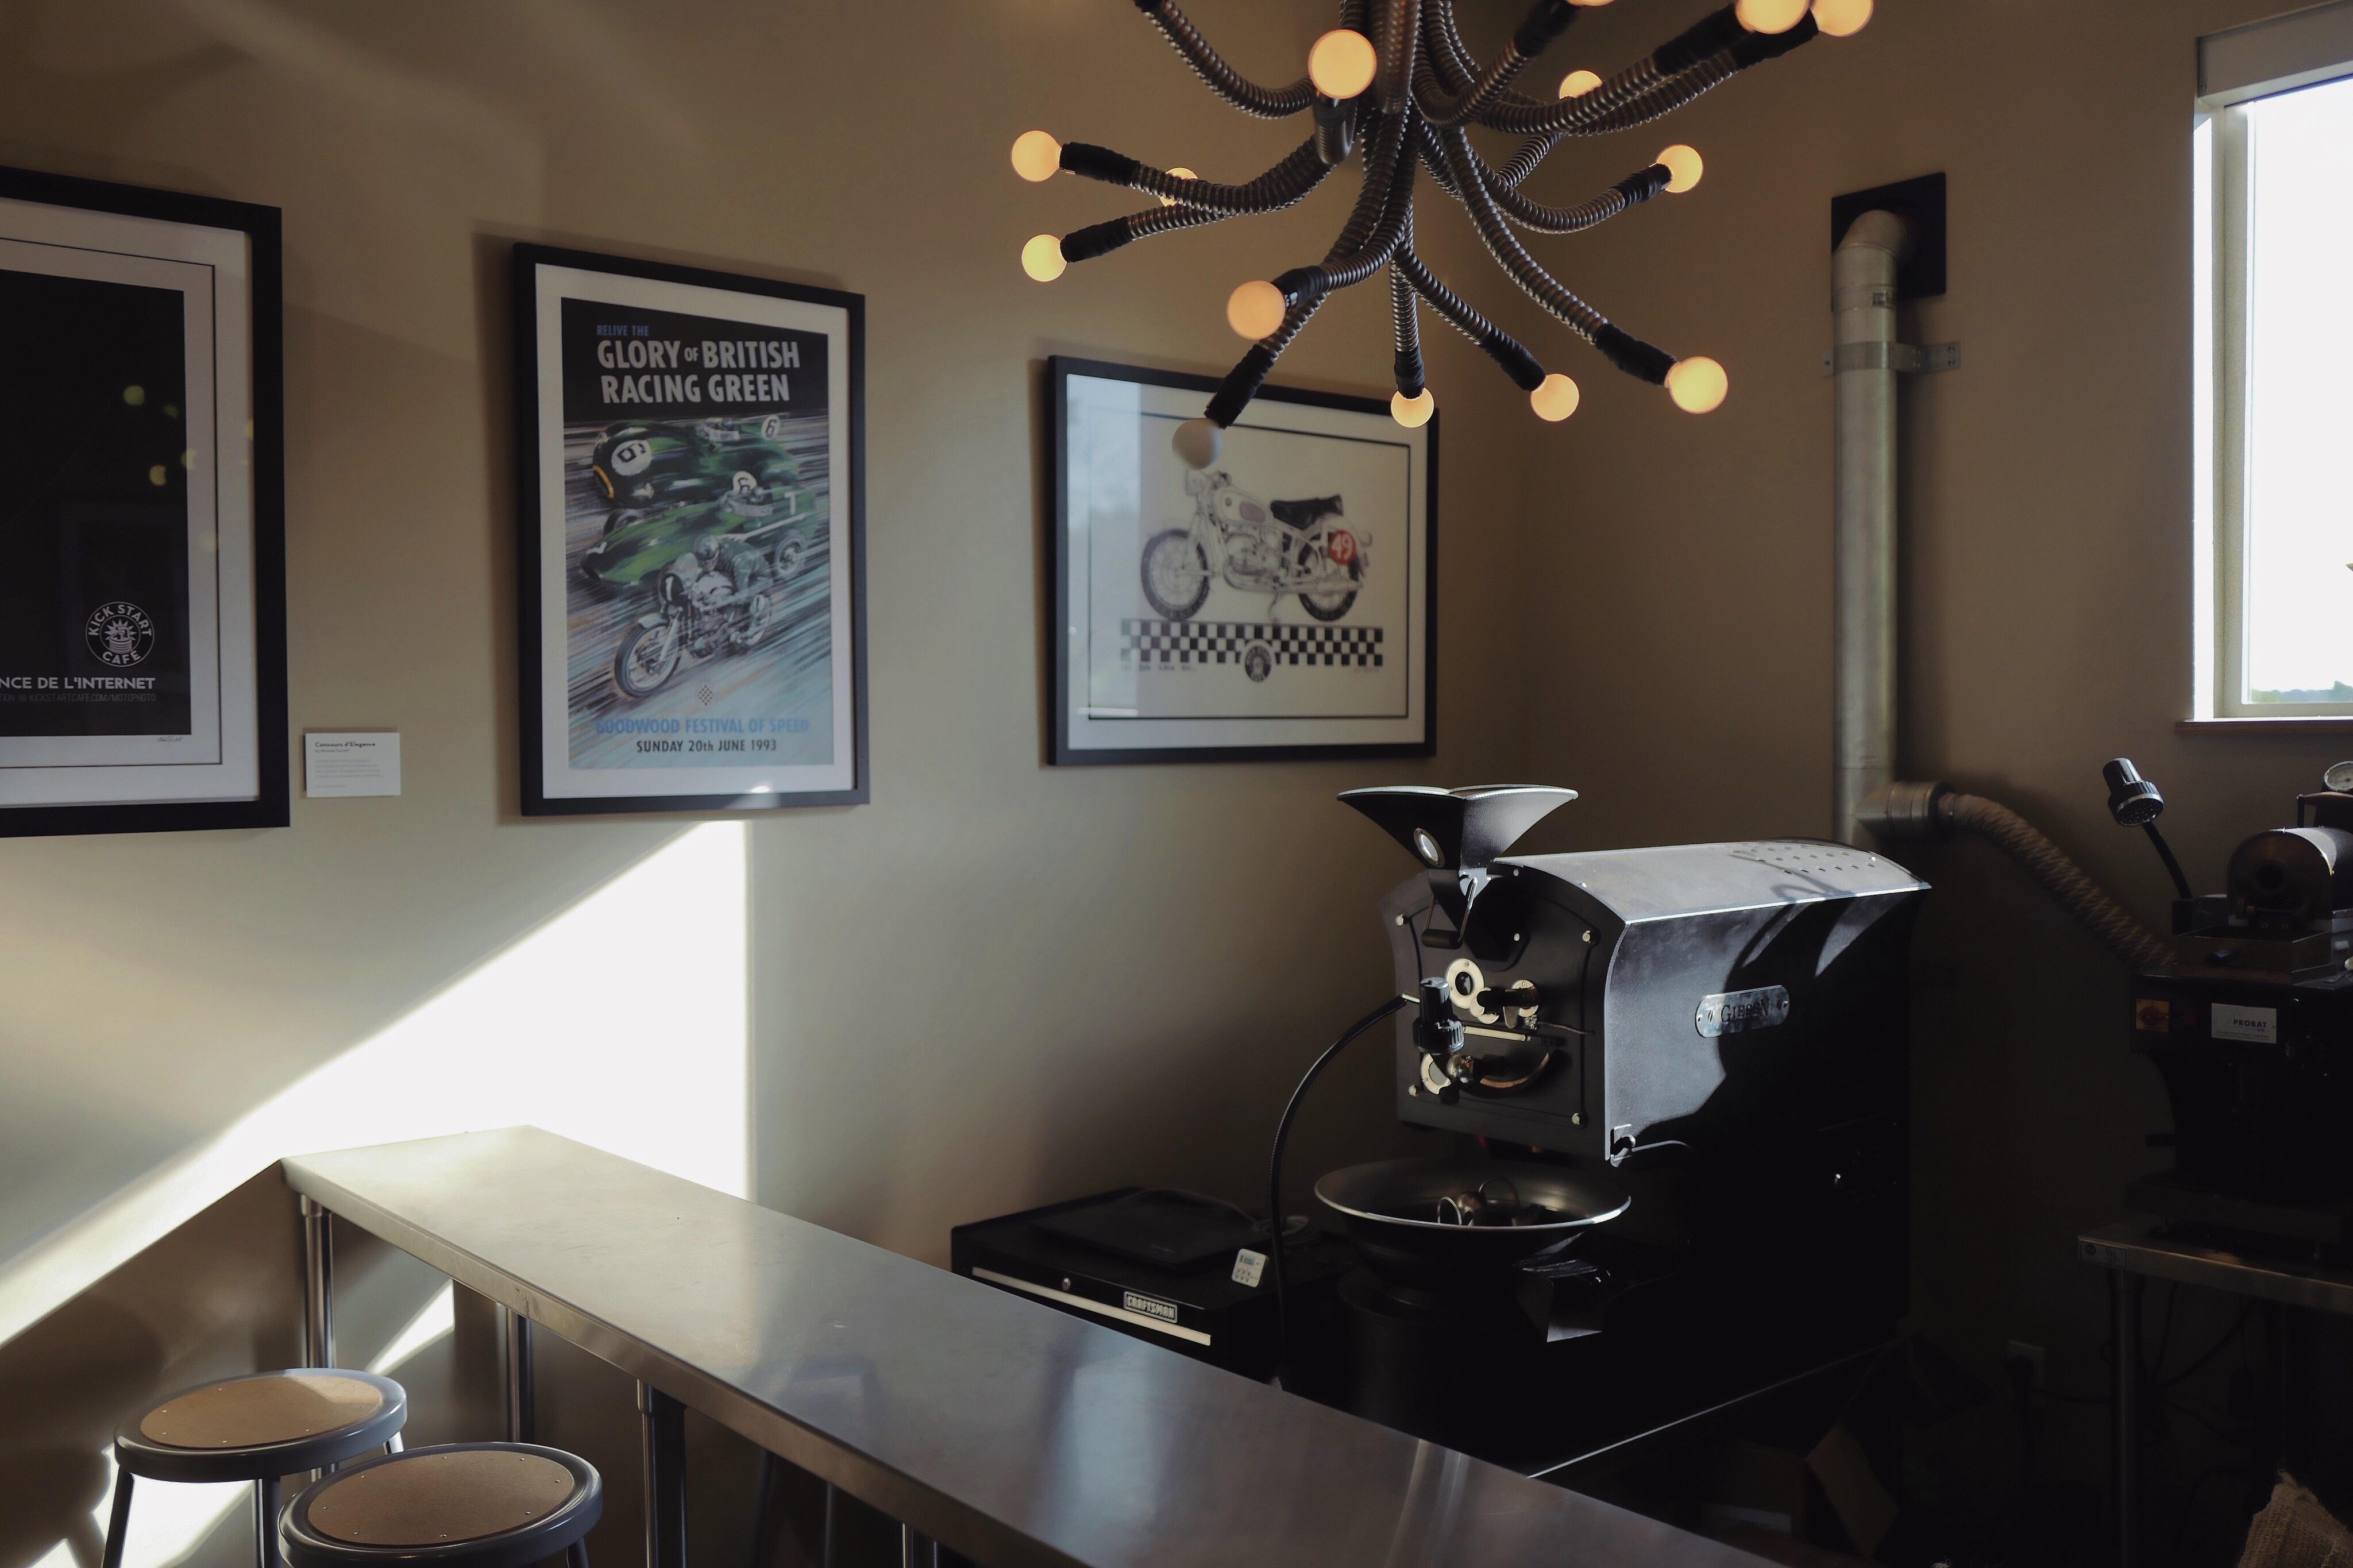 restaurante casa sala habitacin iluminacin diseo de interiores diseo comedor